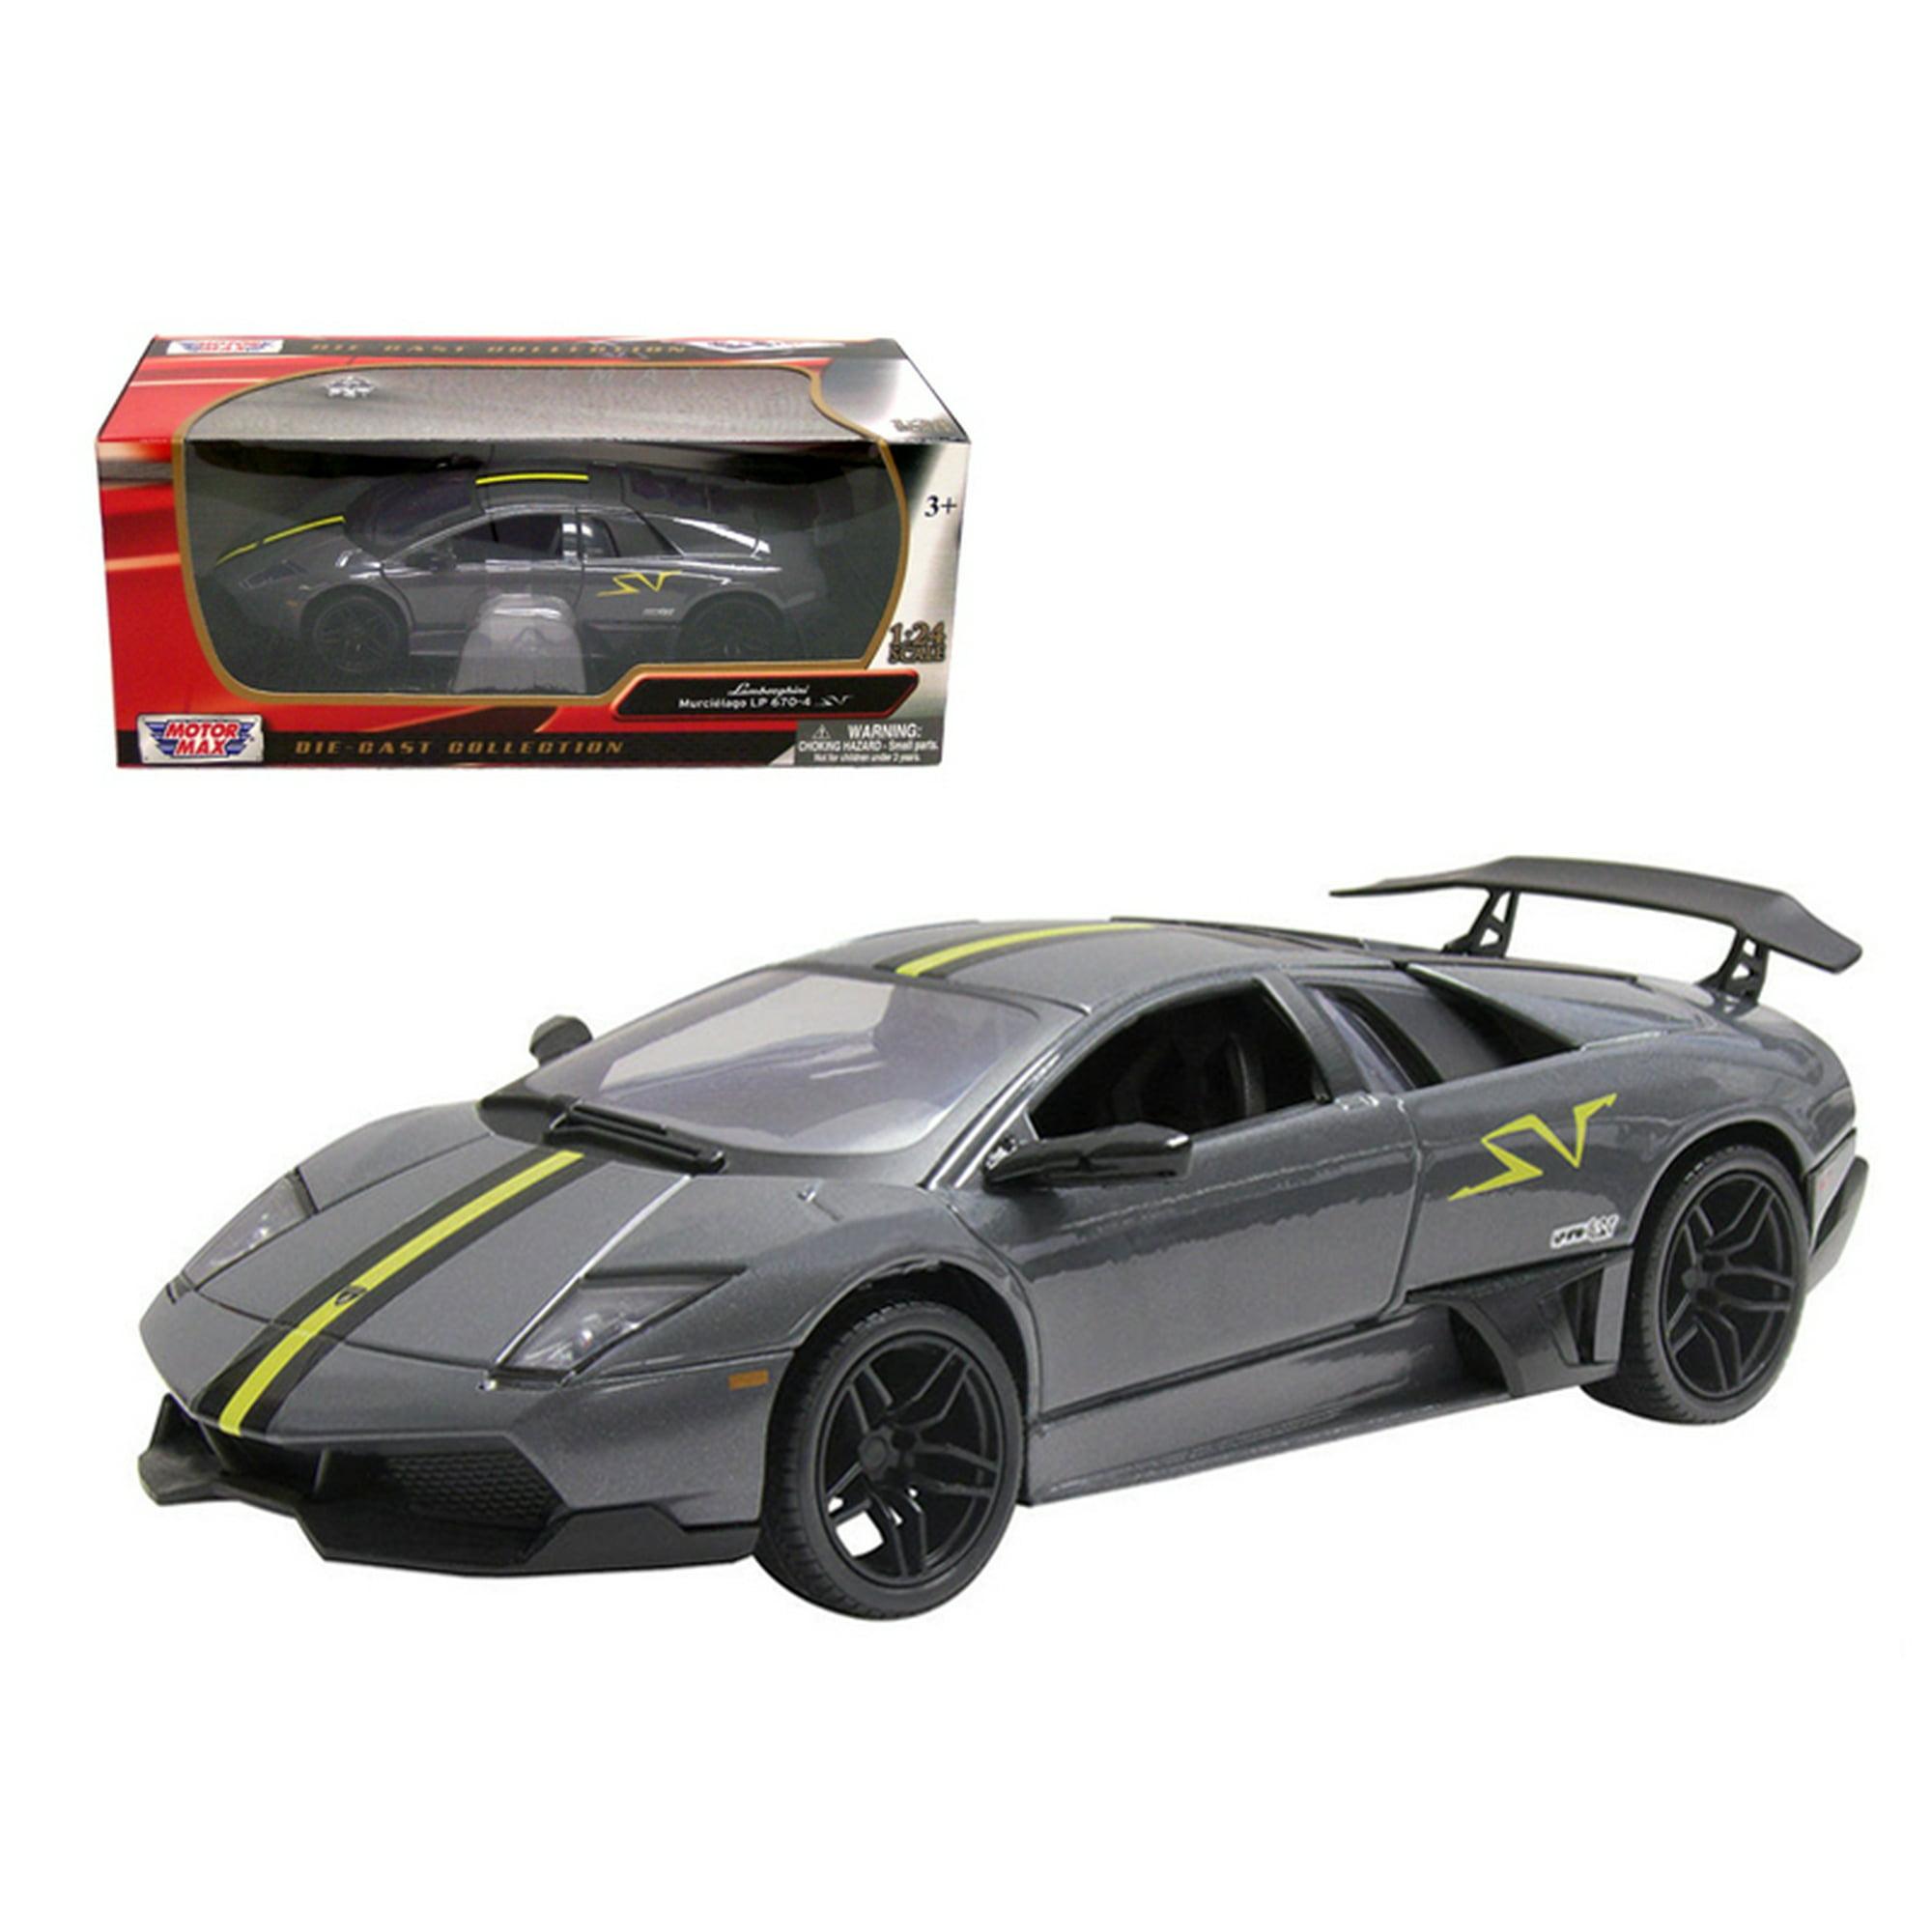 Lamborghini Murcielago Lp 670 4 Sv Grey Diecast Model Car 1 24 By